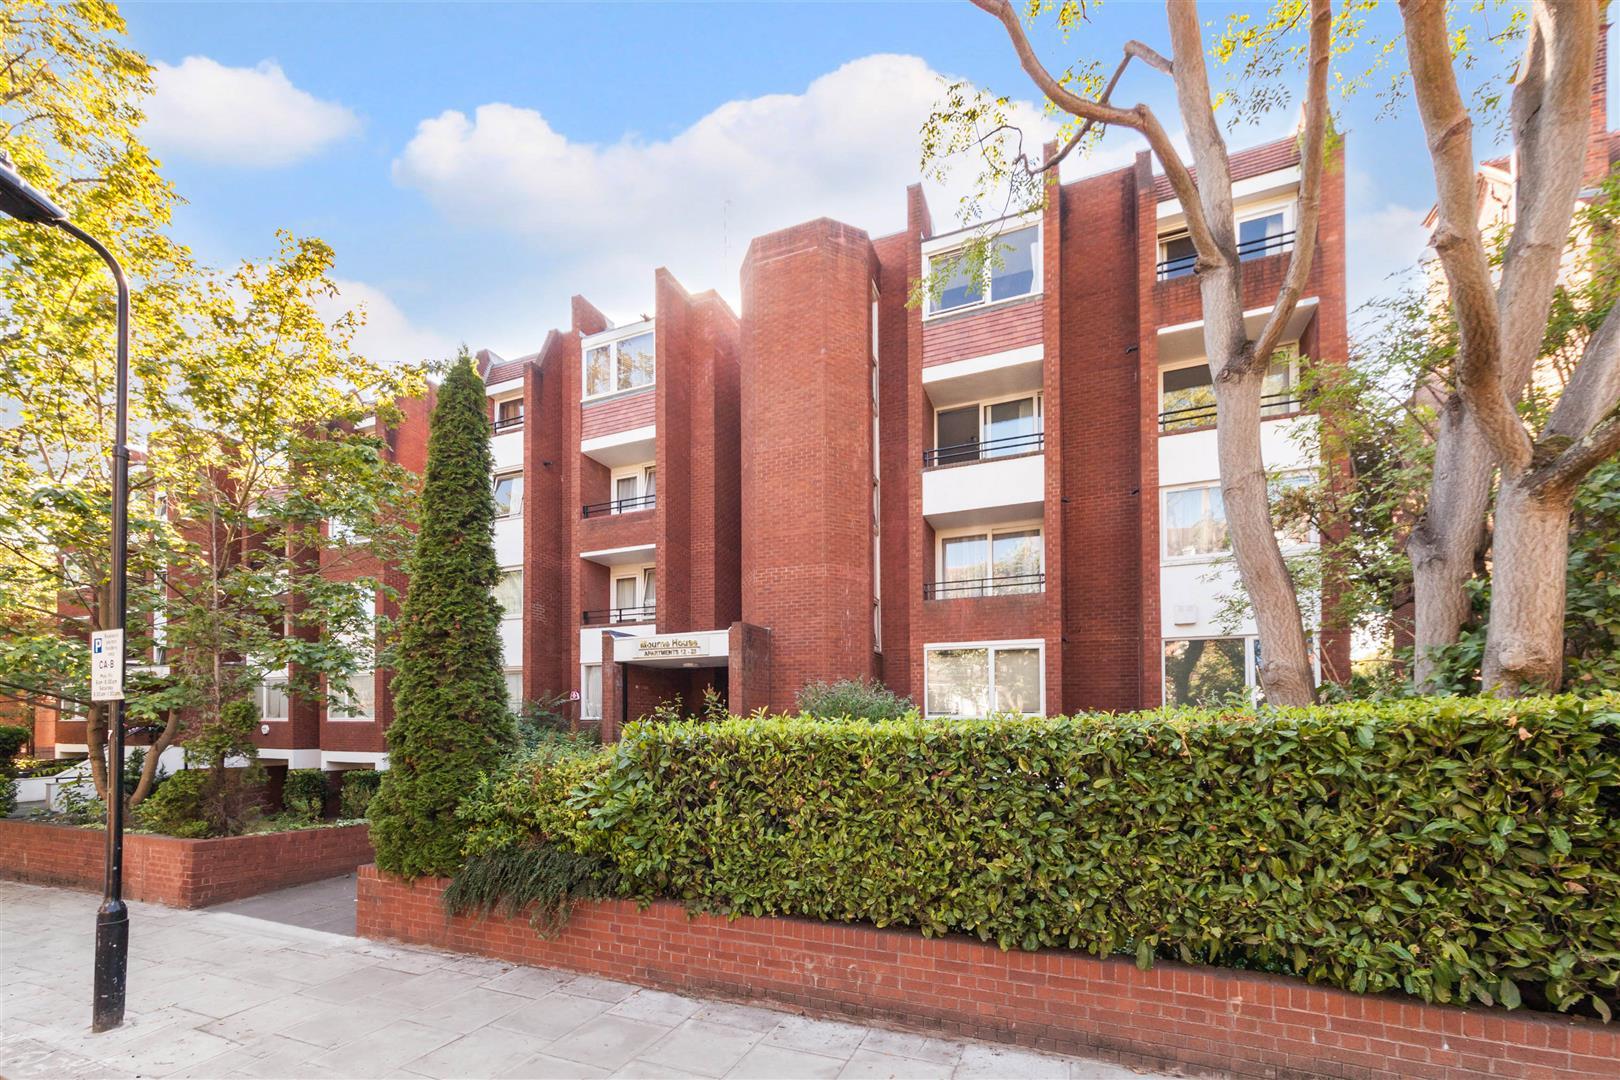 2 Bedrooms Flat for sale in Maresfield Gardens, Hampstead, NW3